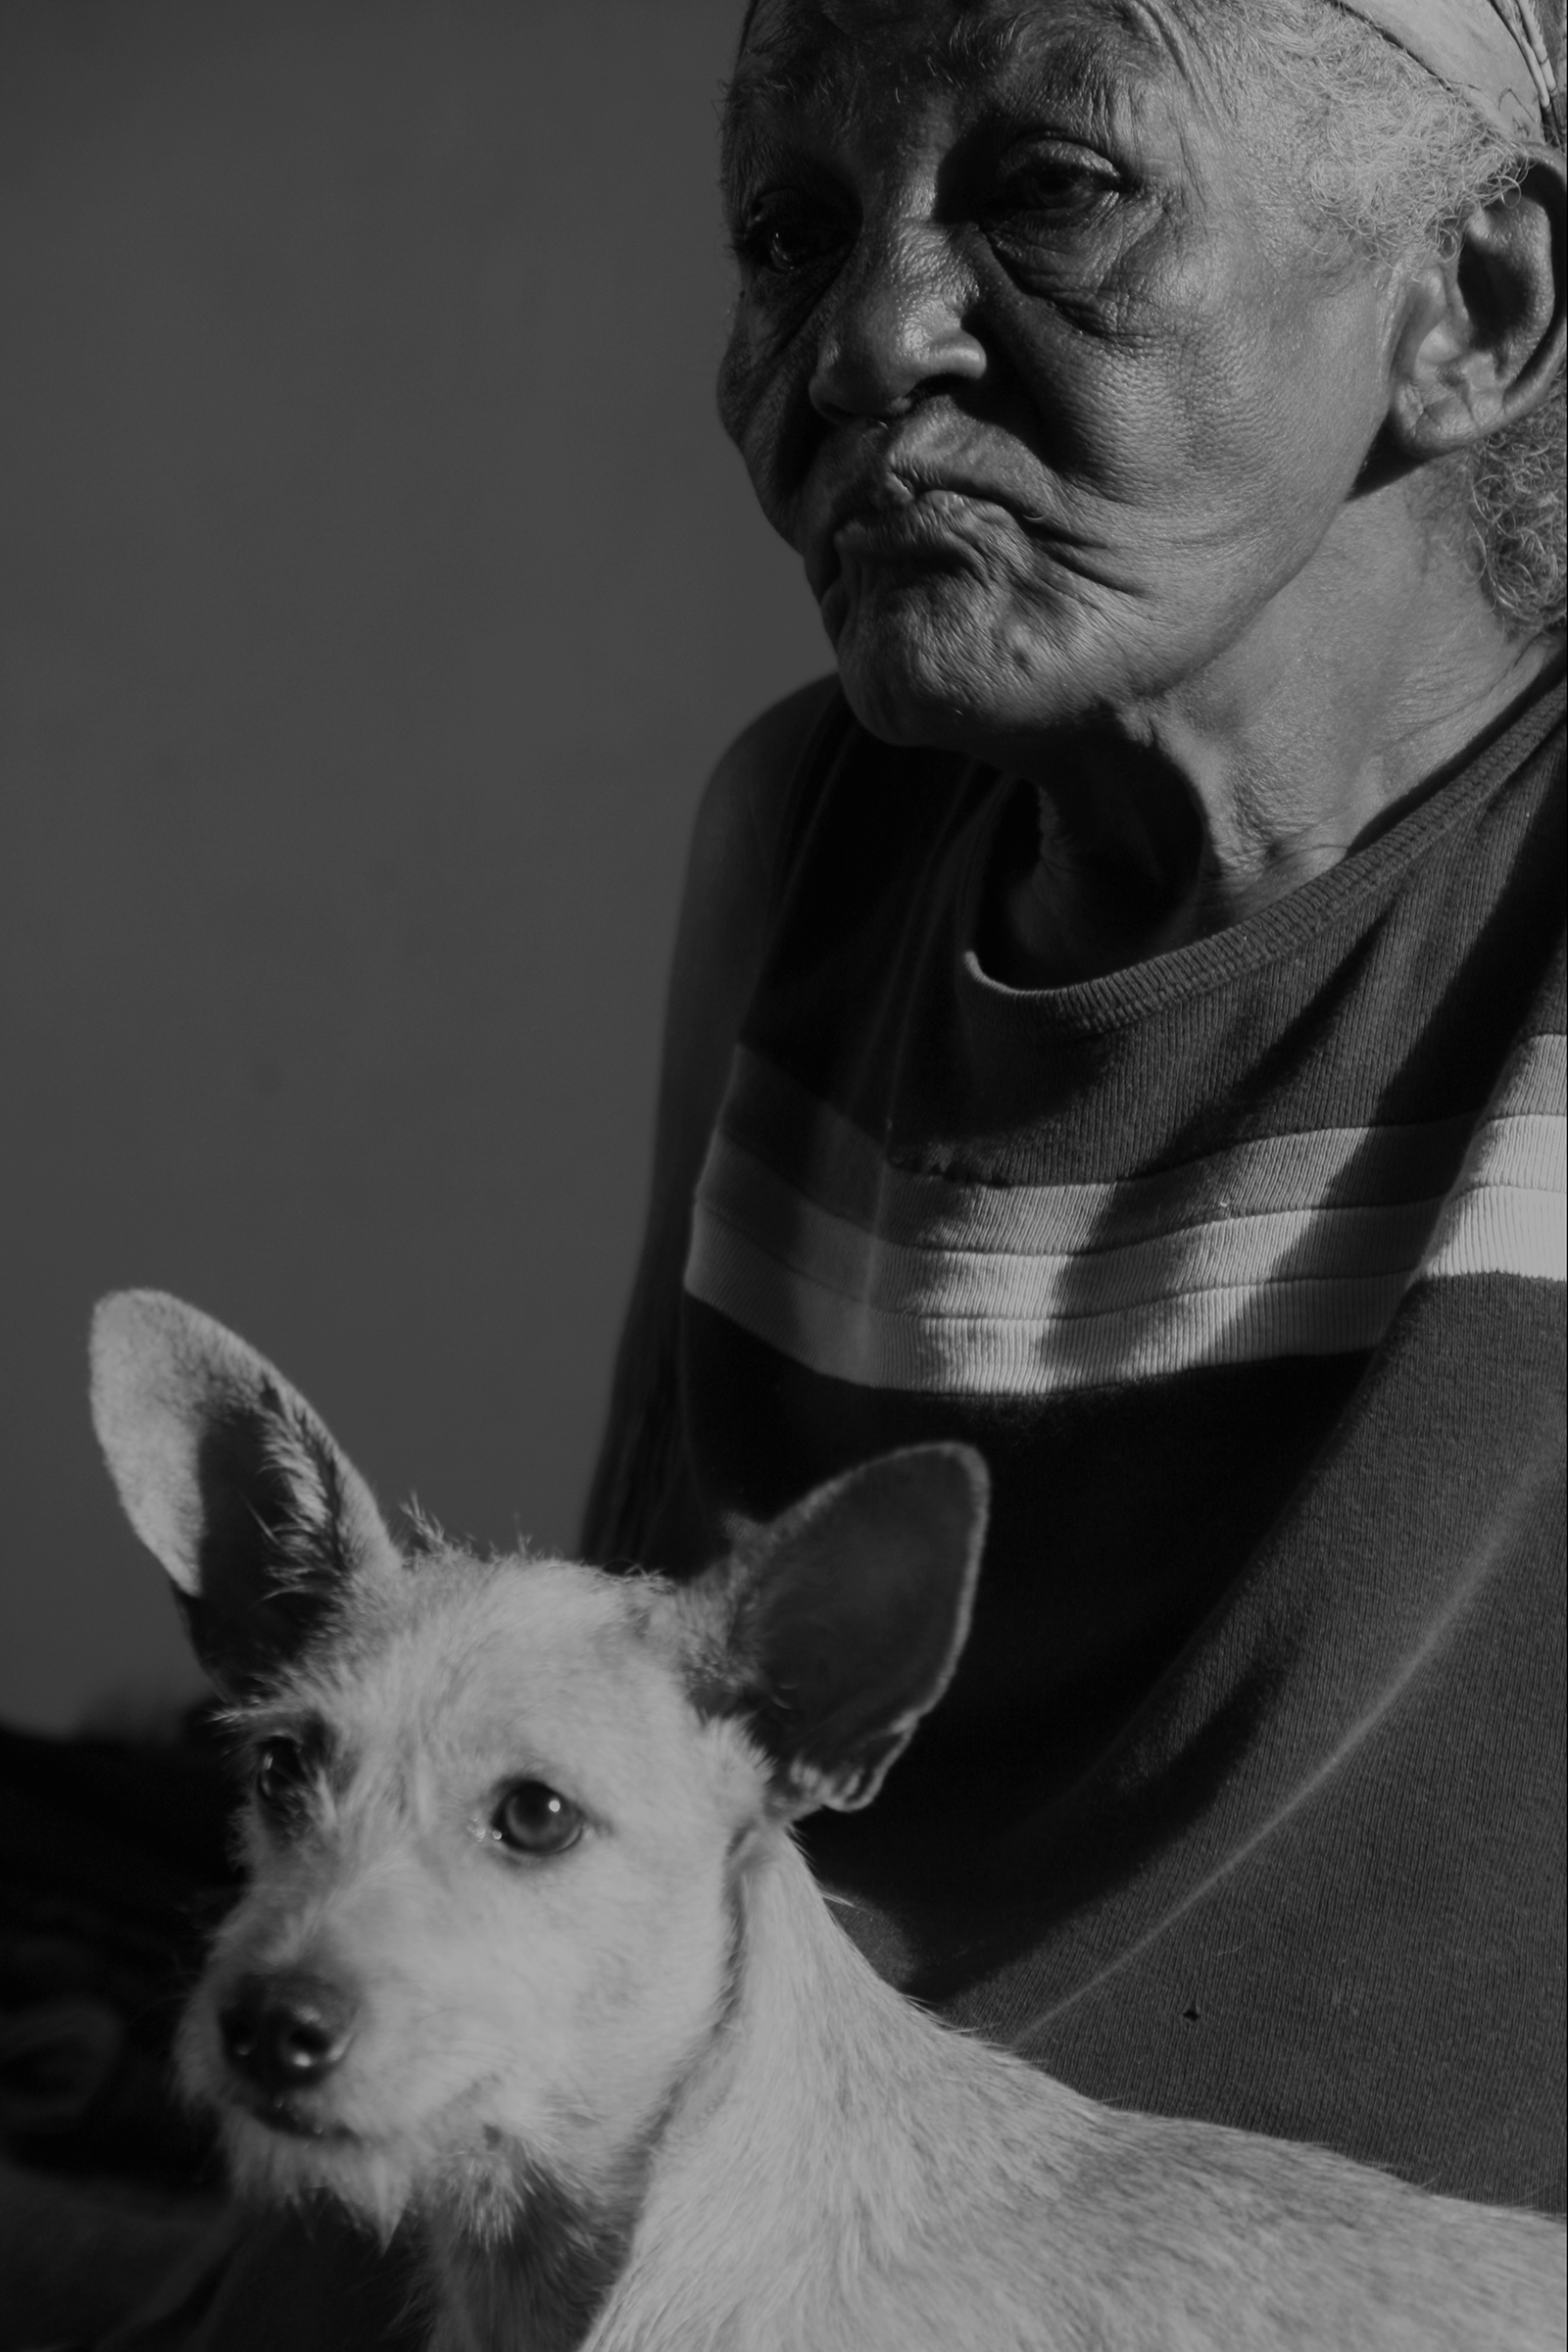 Mayito's mom and her dog